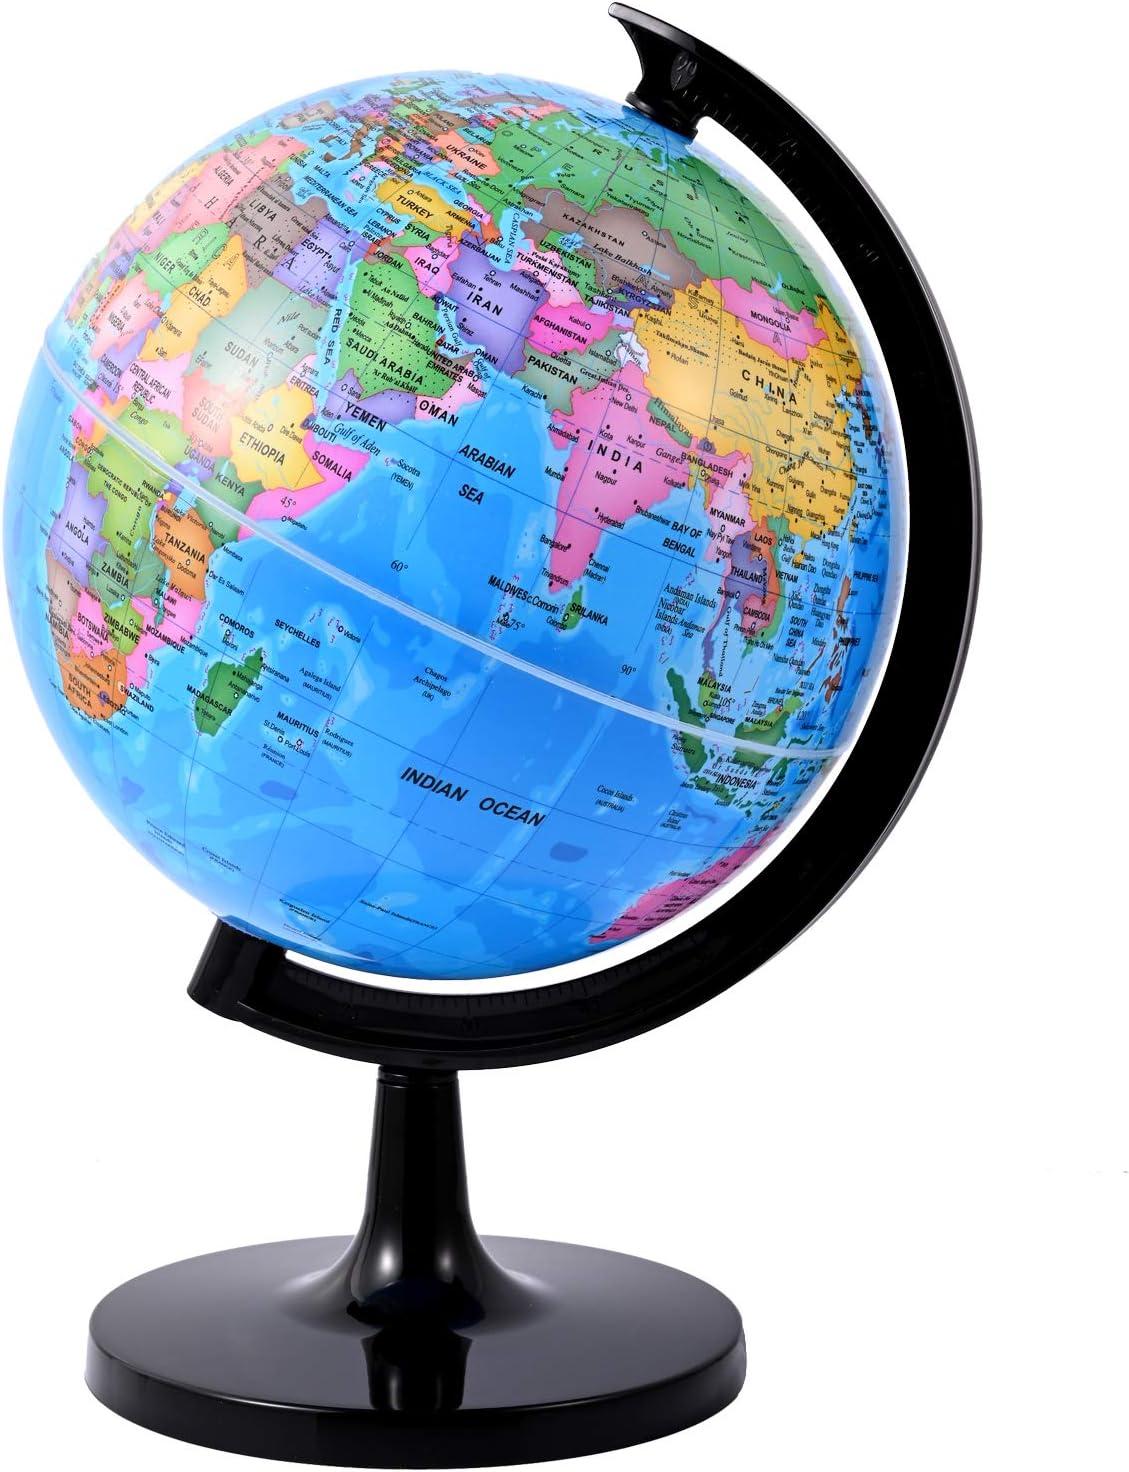 Wizdar Popular brand 8'' World Globe for Kids Assemble DIY latest Learning Education